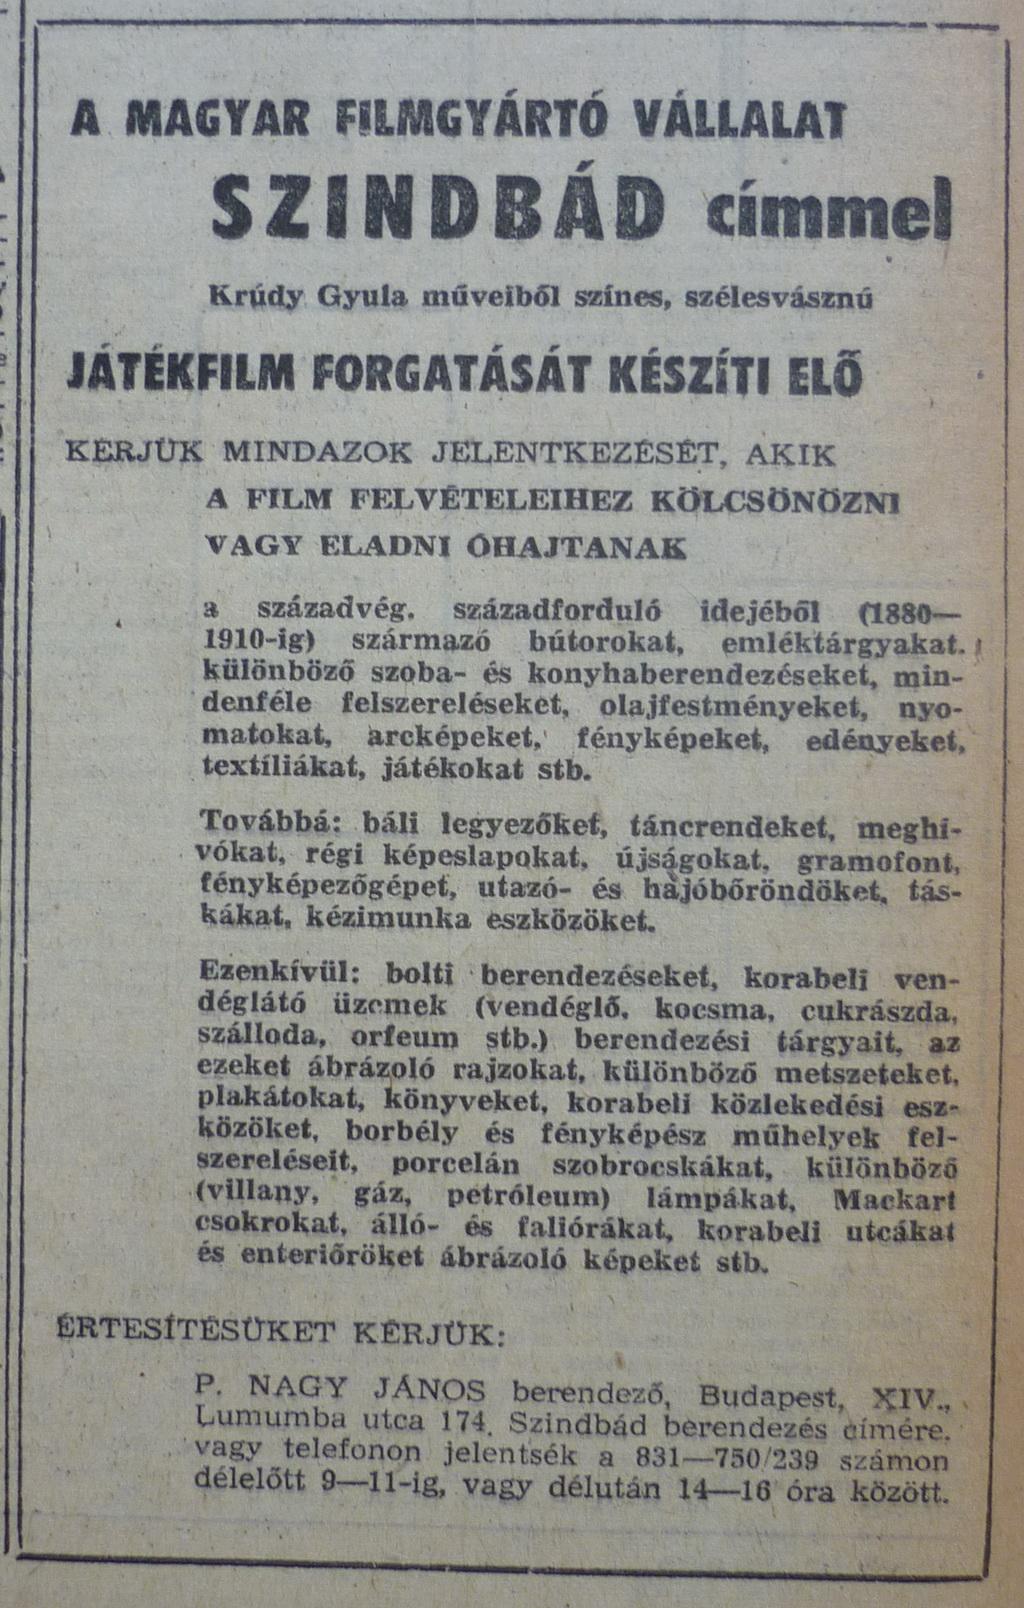 szinbad-197007-magyarnemzethirdetes.jpg